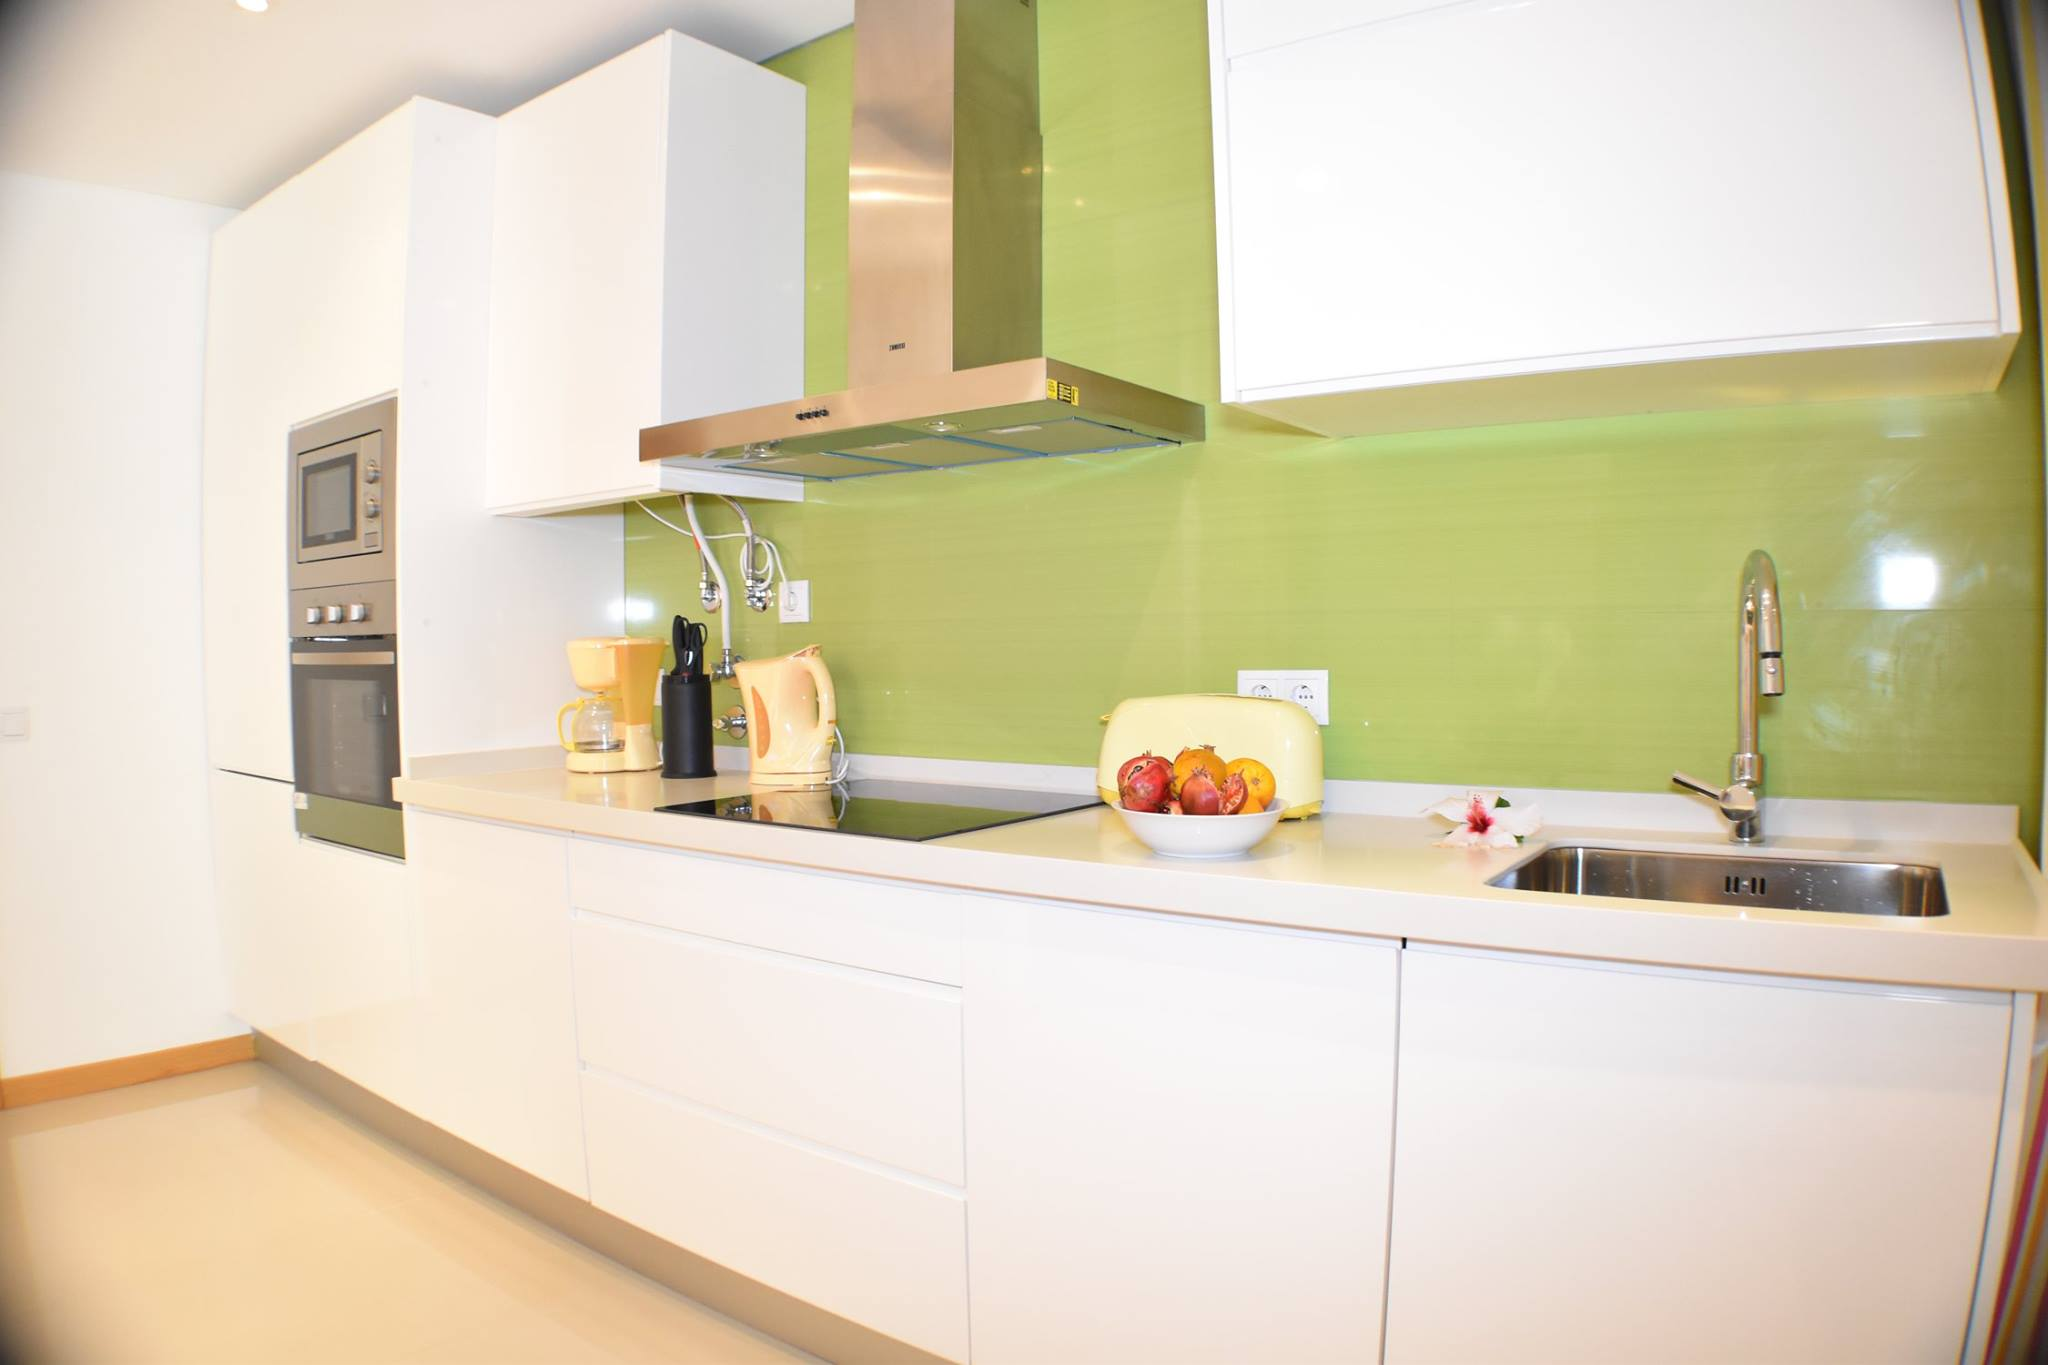 Stylish 2 Bedroom Duplex Apartment in Albufeira  - Algarve